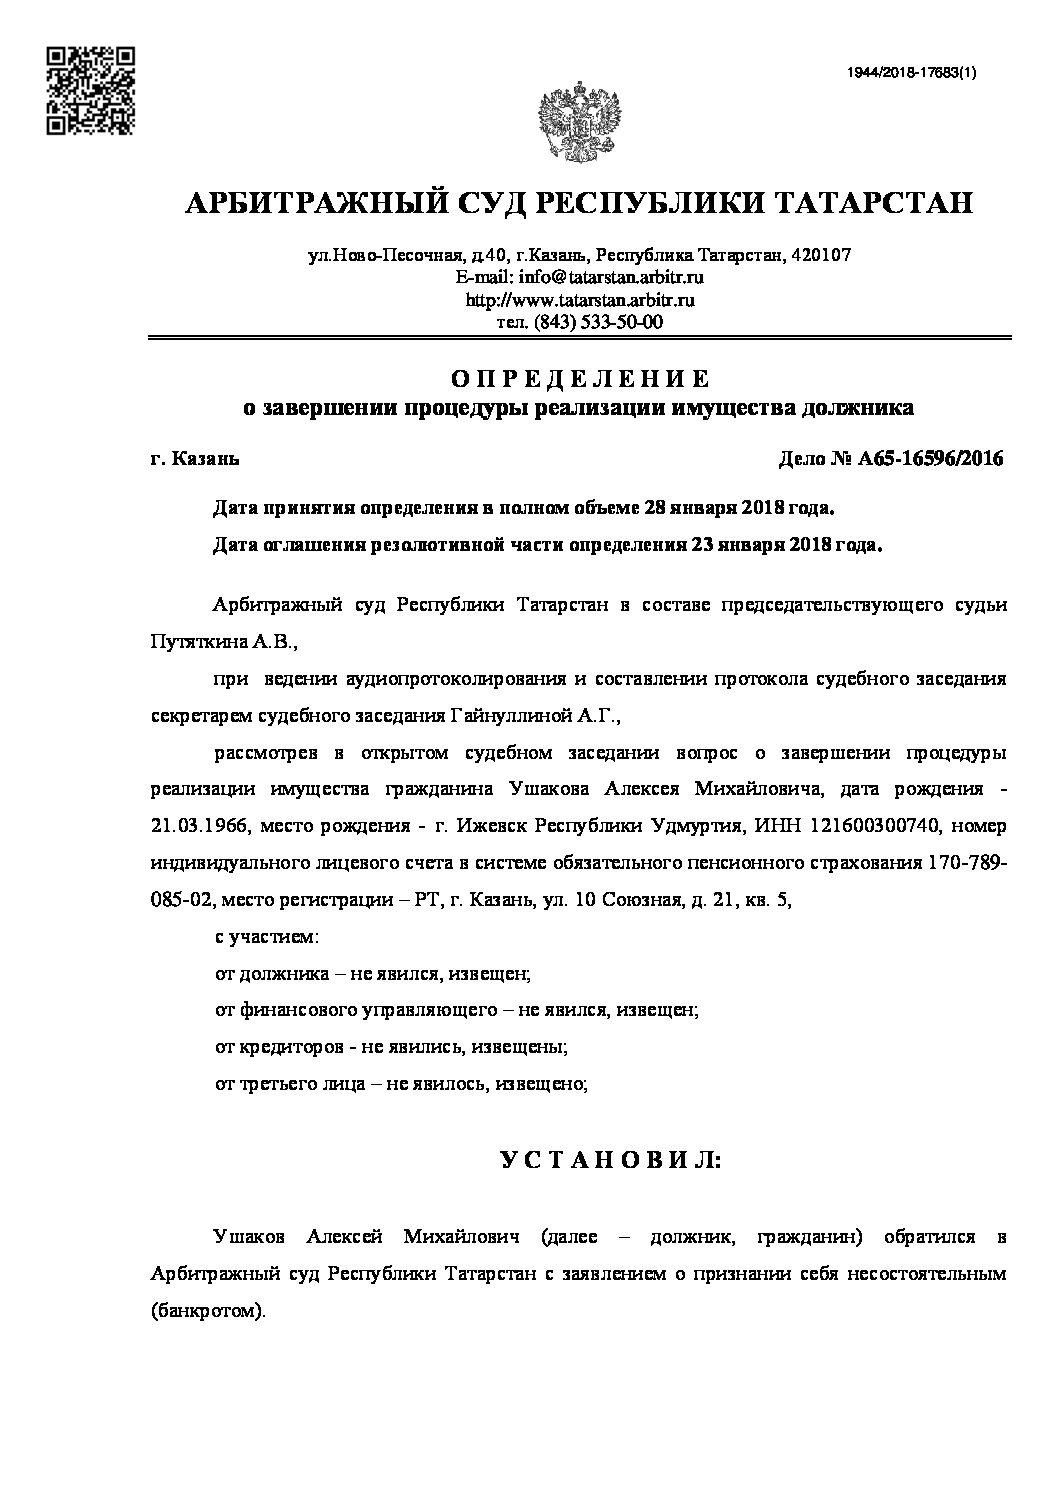 А65-16596-2016_20180128